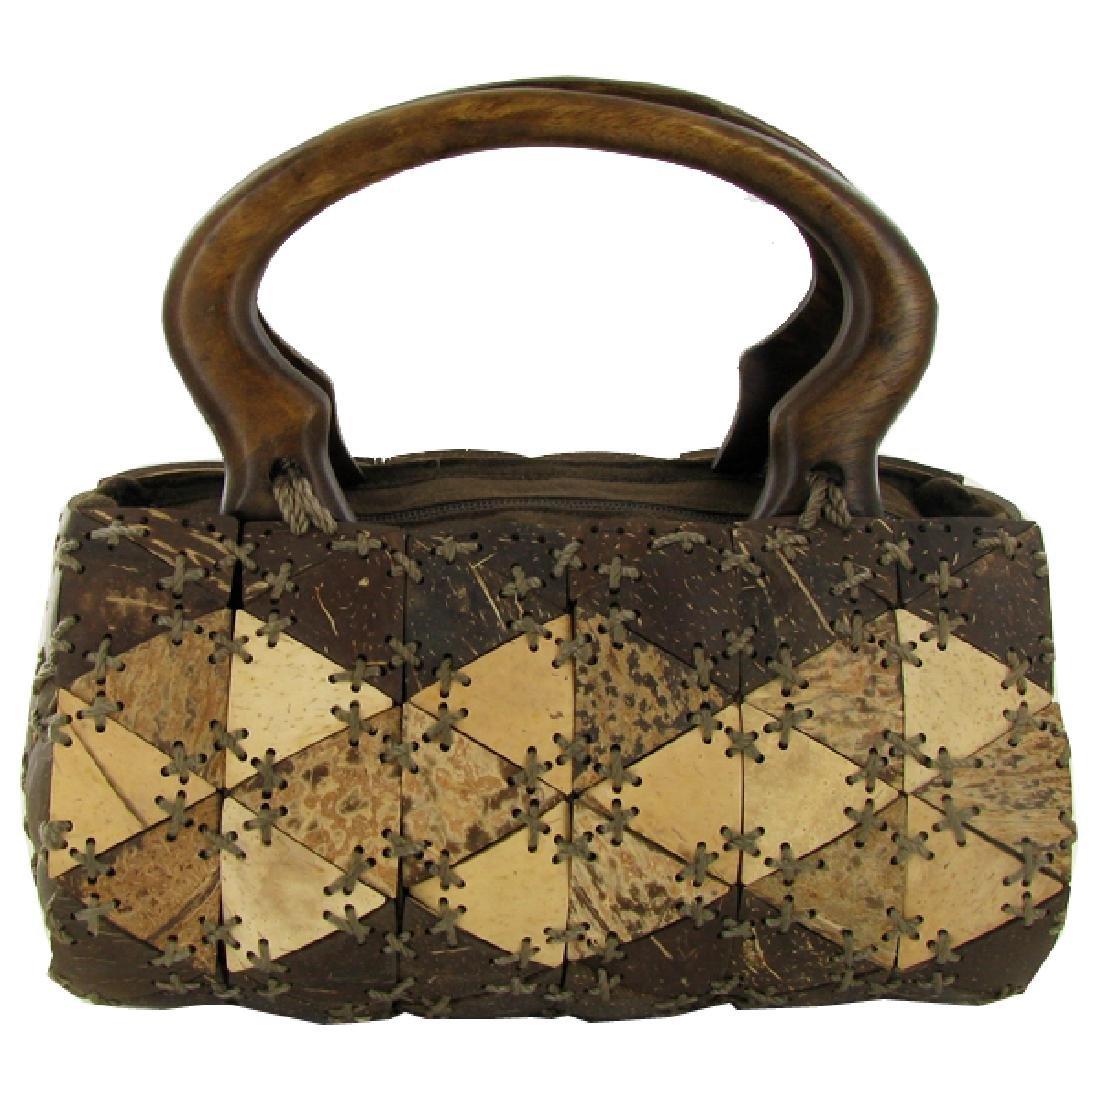 Handcrafted Polished Coconut Shell Handbag